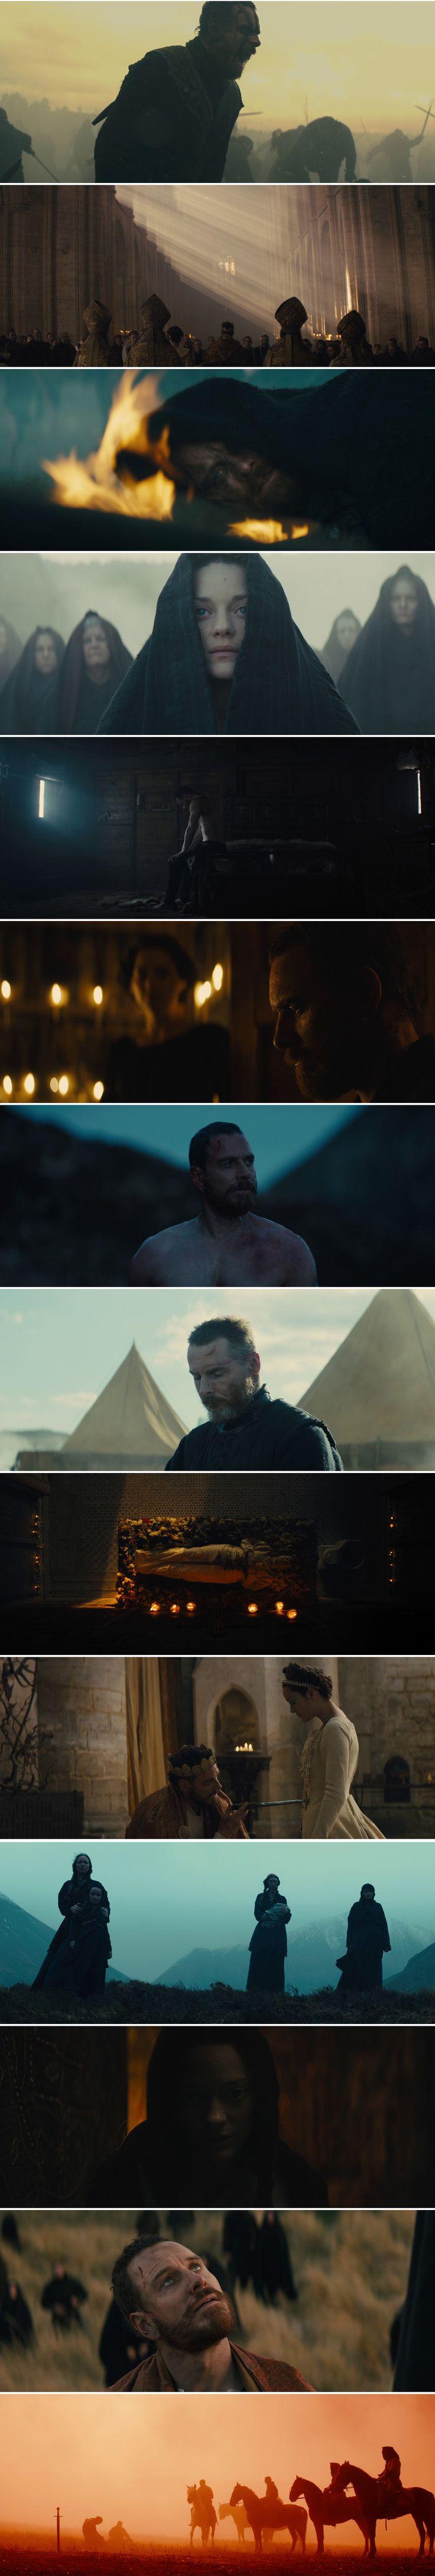 Macbeth (2015) Directed by Justin Kurzel. Cinematography by Adam Arkapaw.